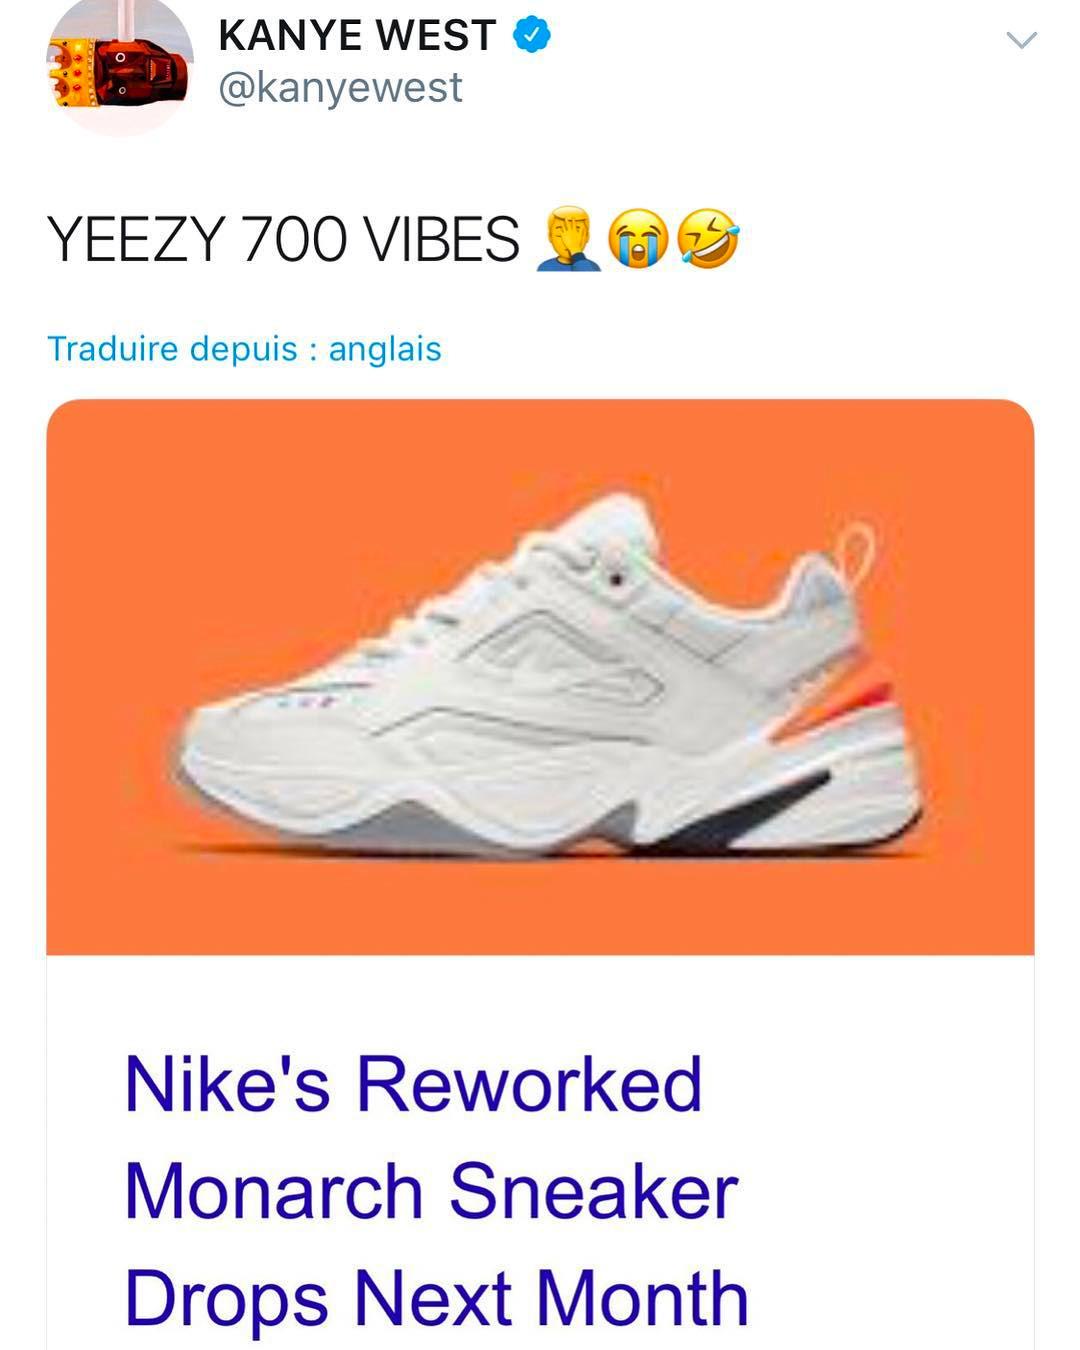 M2K,Nike,AO3108-001 AO3108-001 时隔两年侃爷再发推特,居然是为了怼 Nike?